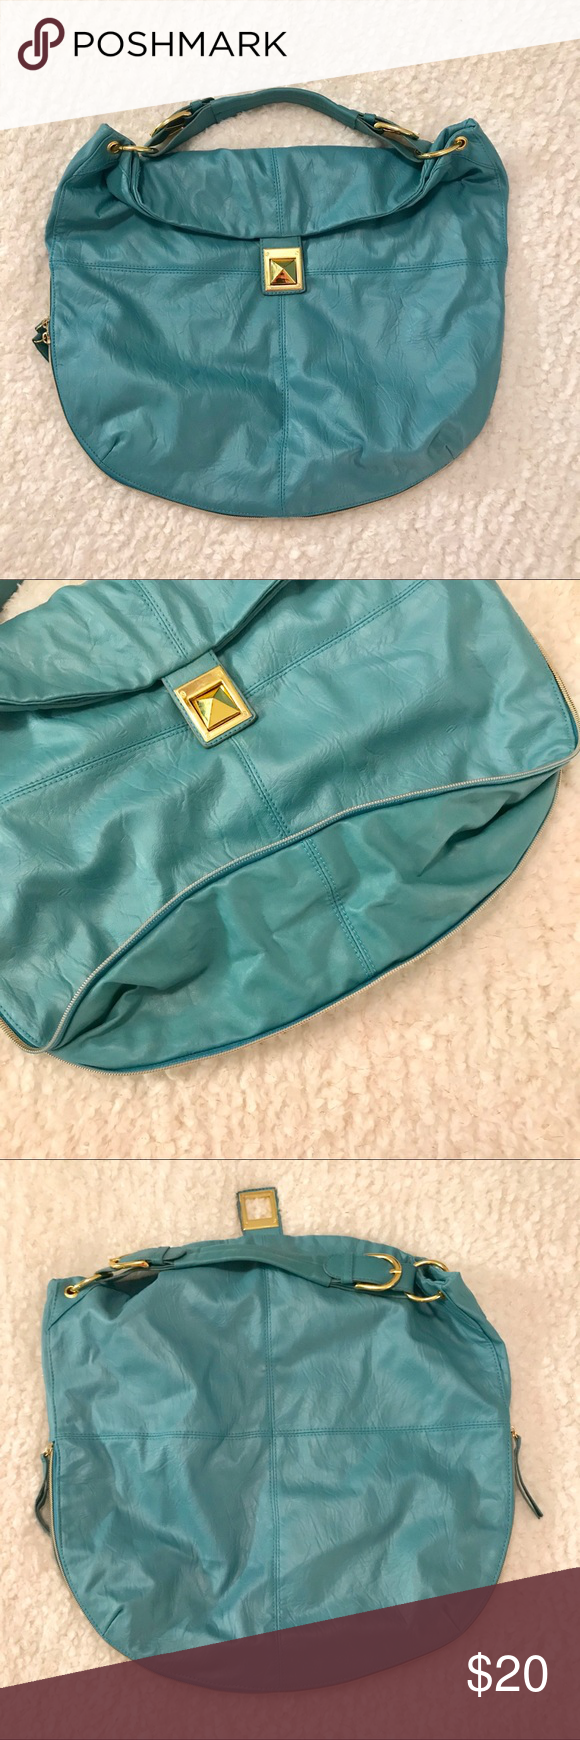 Preloved Mark Teal Hobo Style purse Mark brand hobo style